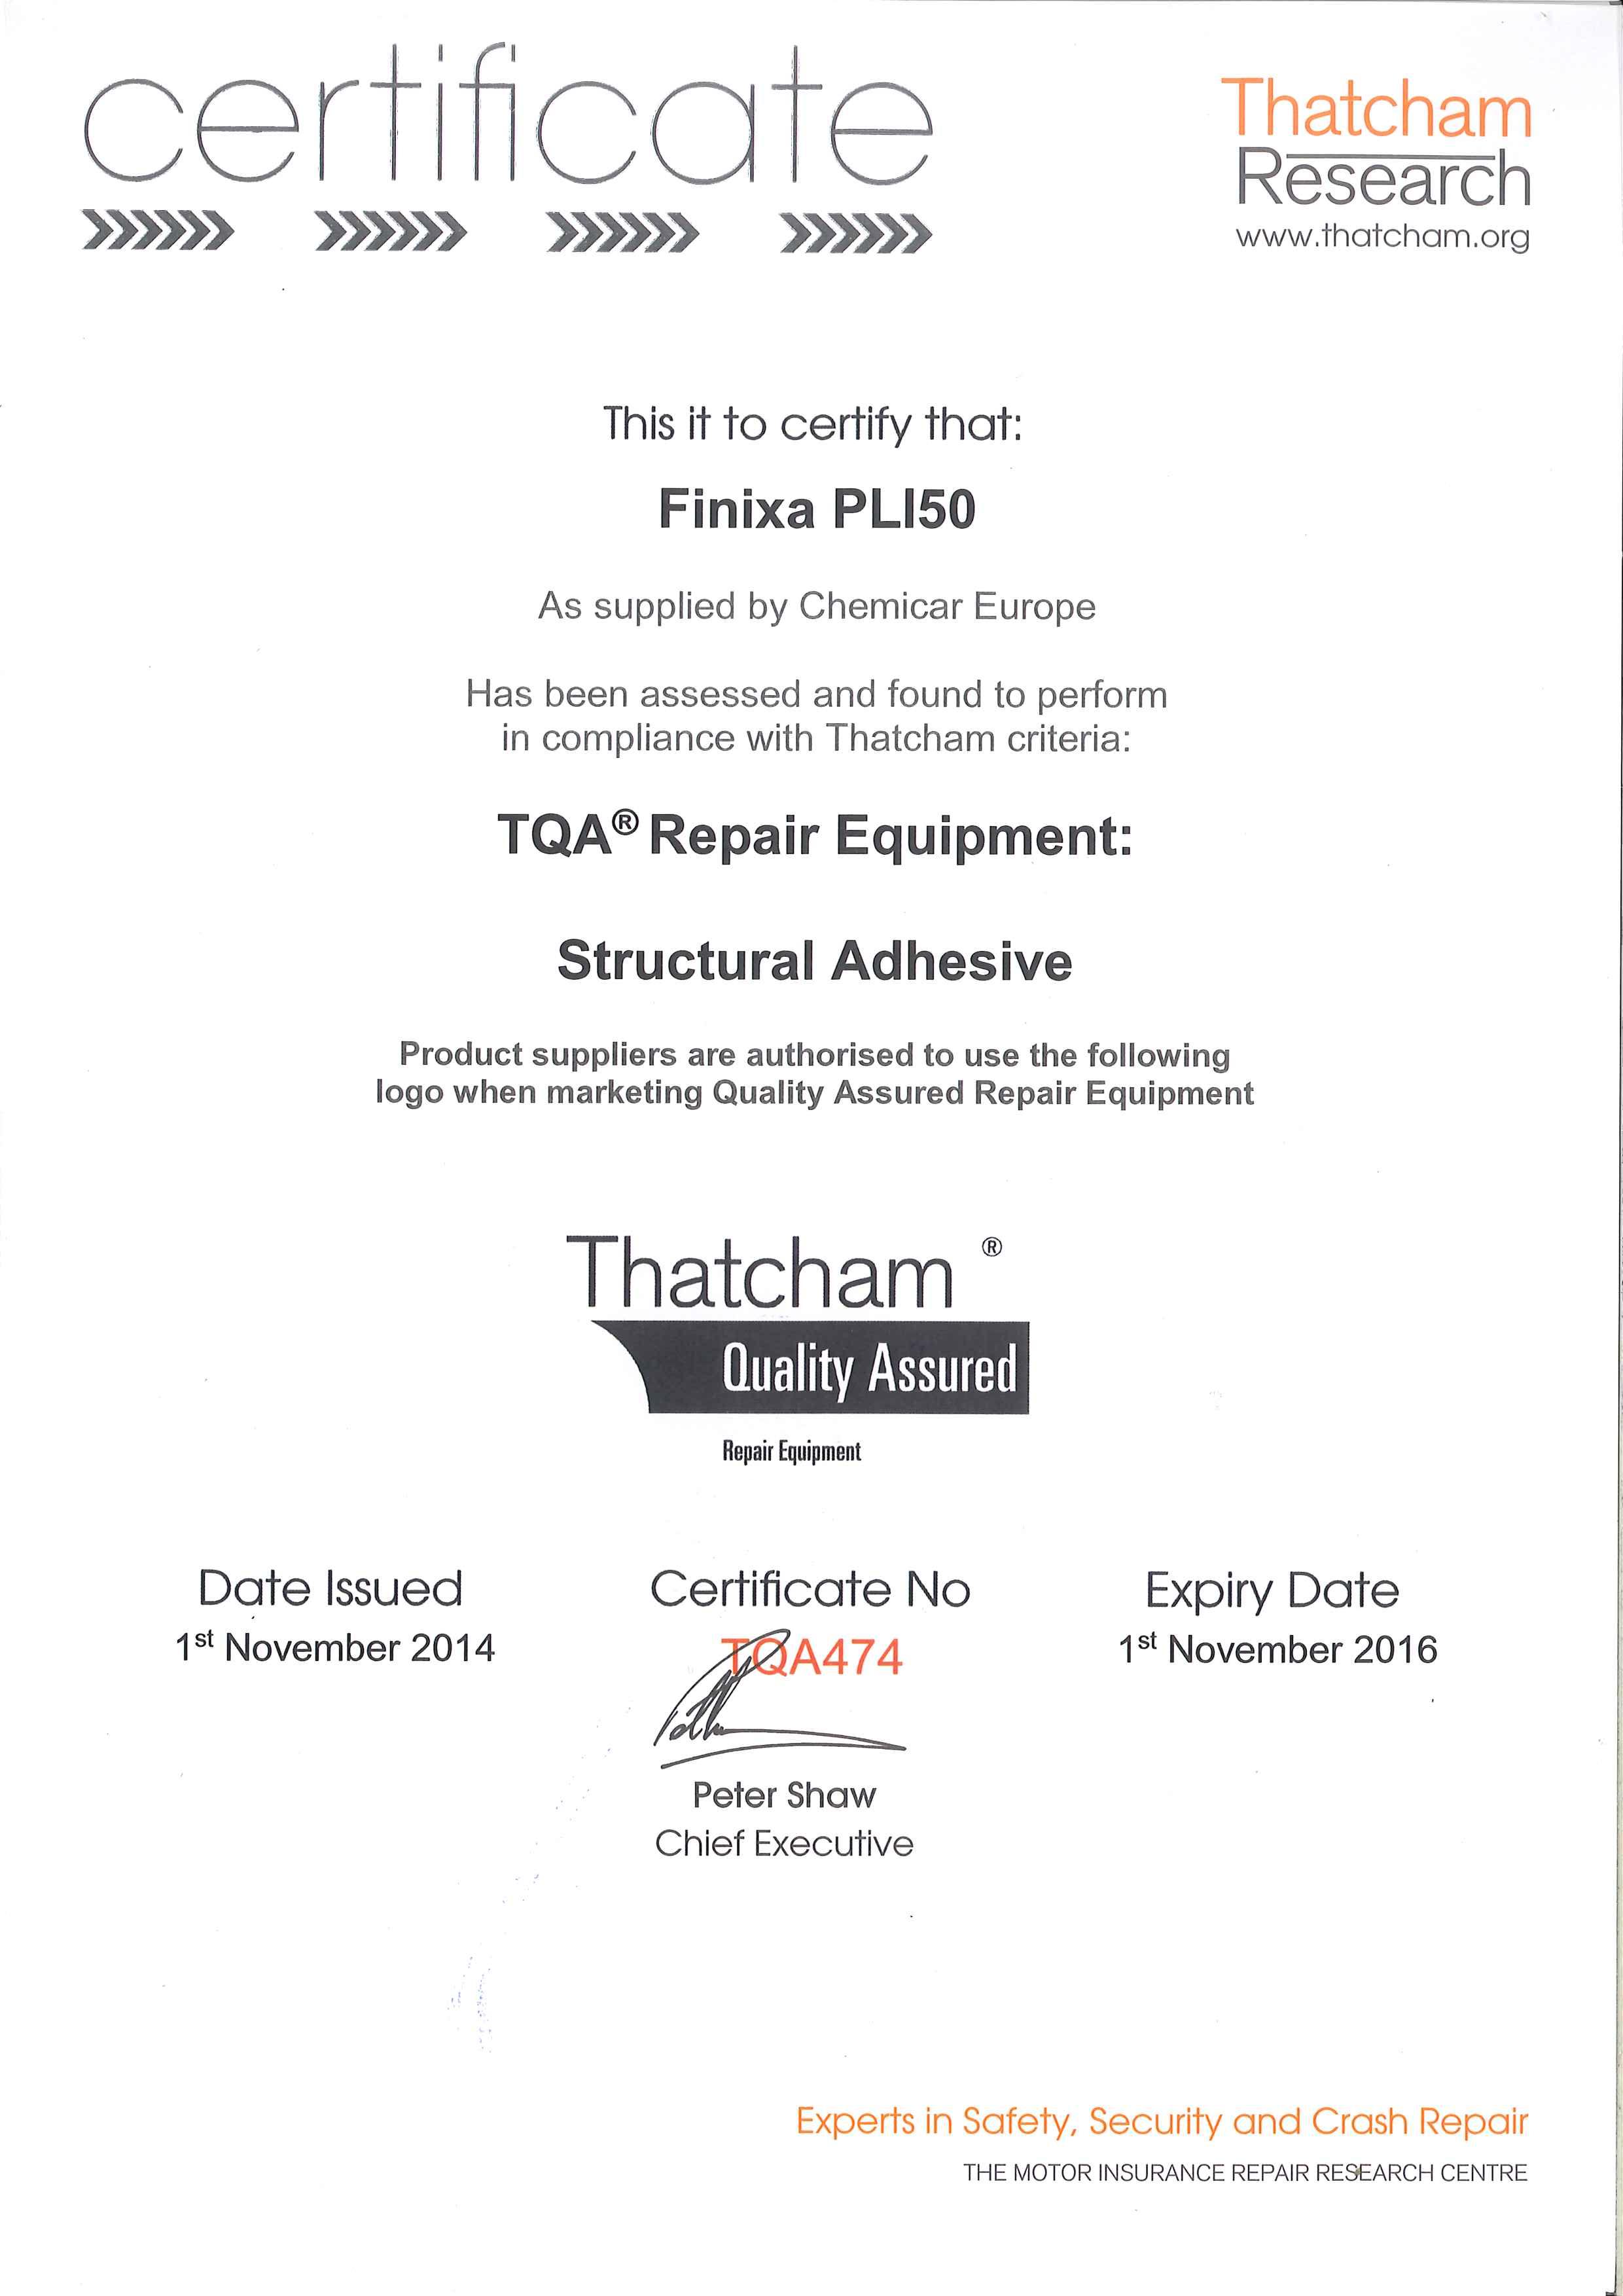 Finixa PLI 50 metal bond is Thatcham zertifiziert